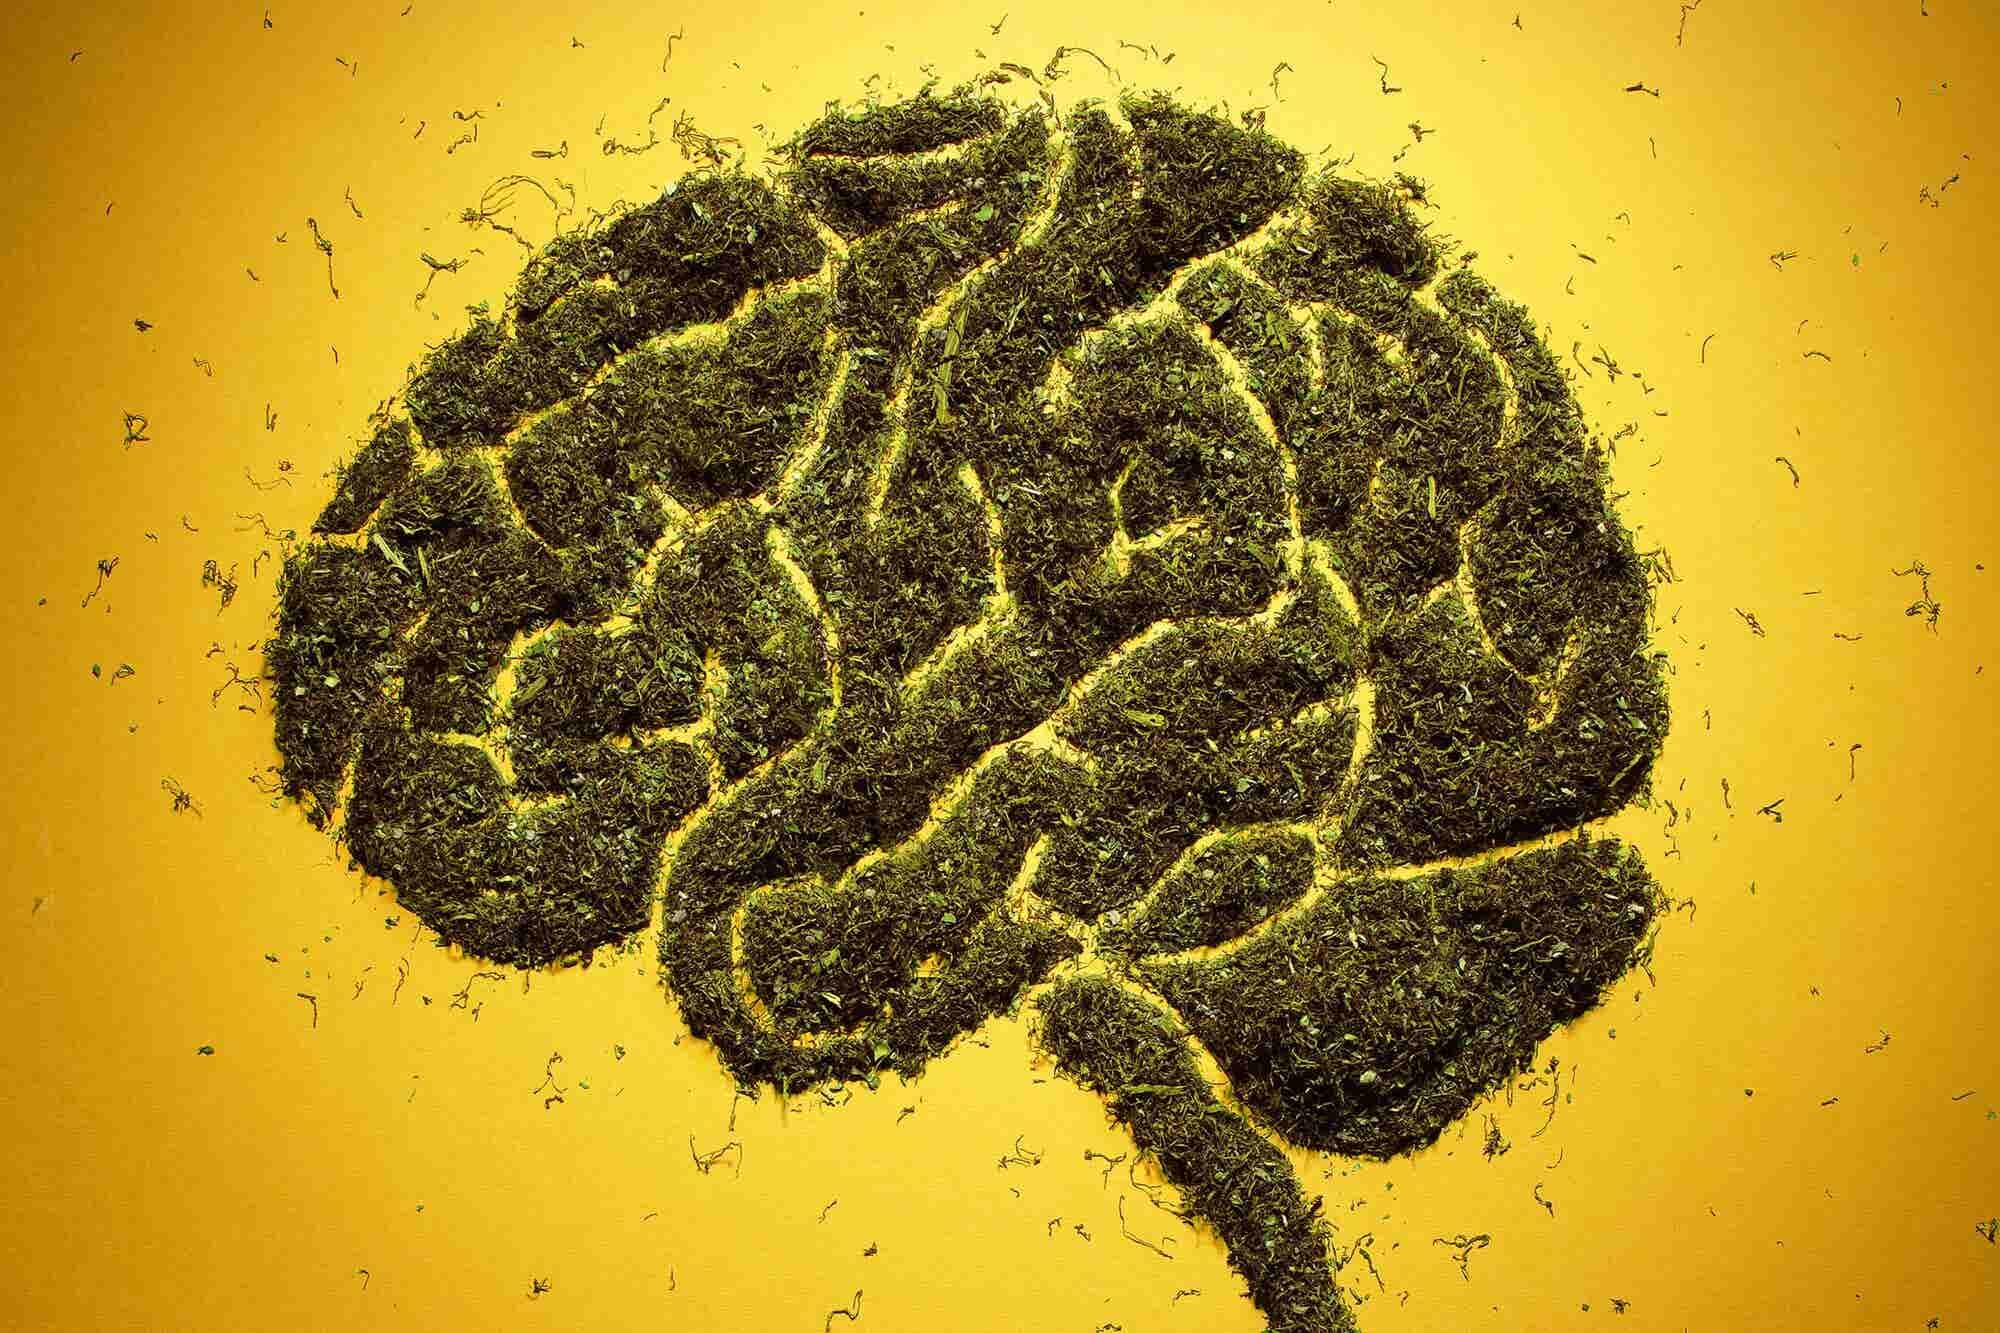 New Study Will Gauge Pot's Effect on Teenage Brains